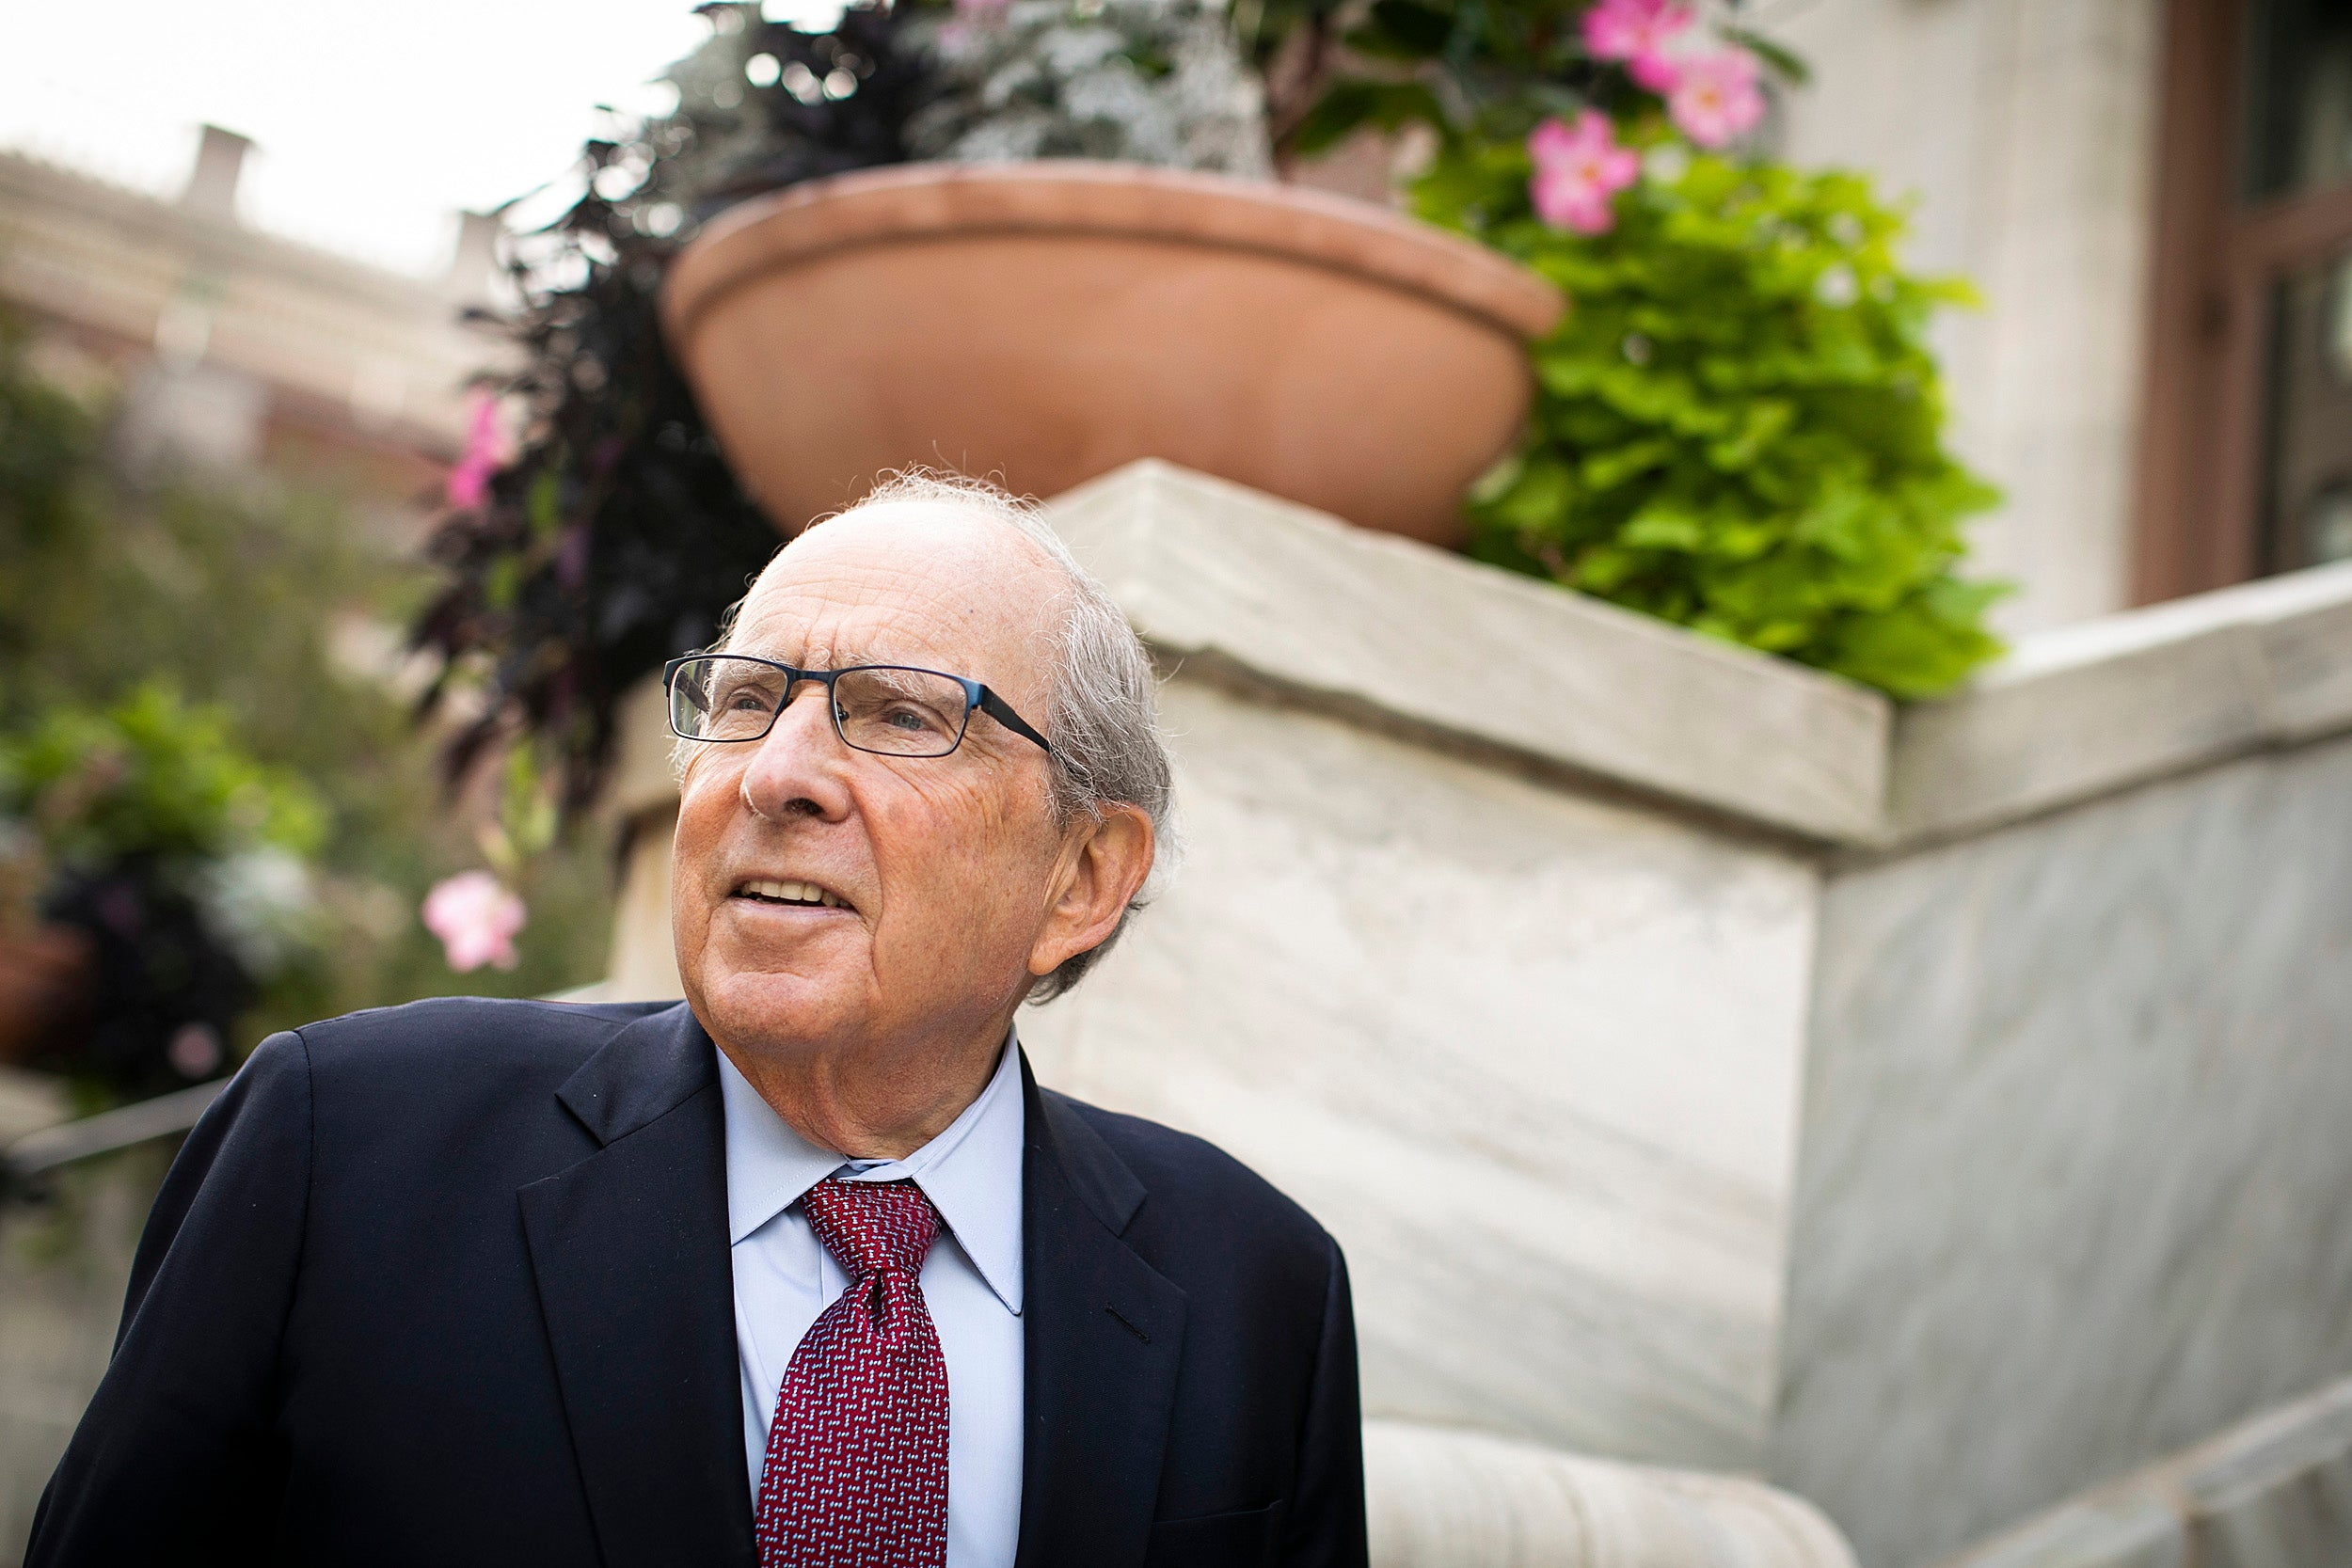 Bruce Donoff examines 28 years as dean of School of Dental Medicine